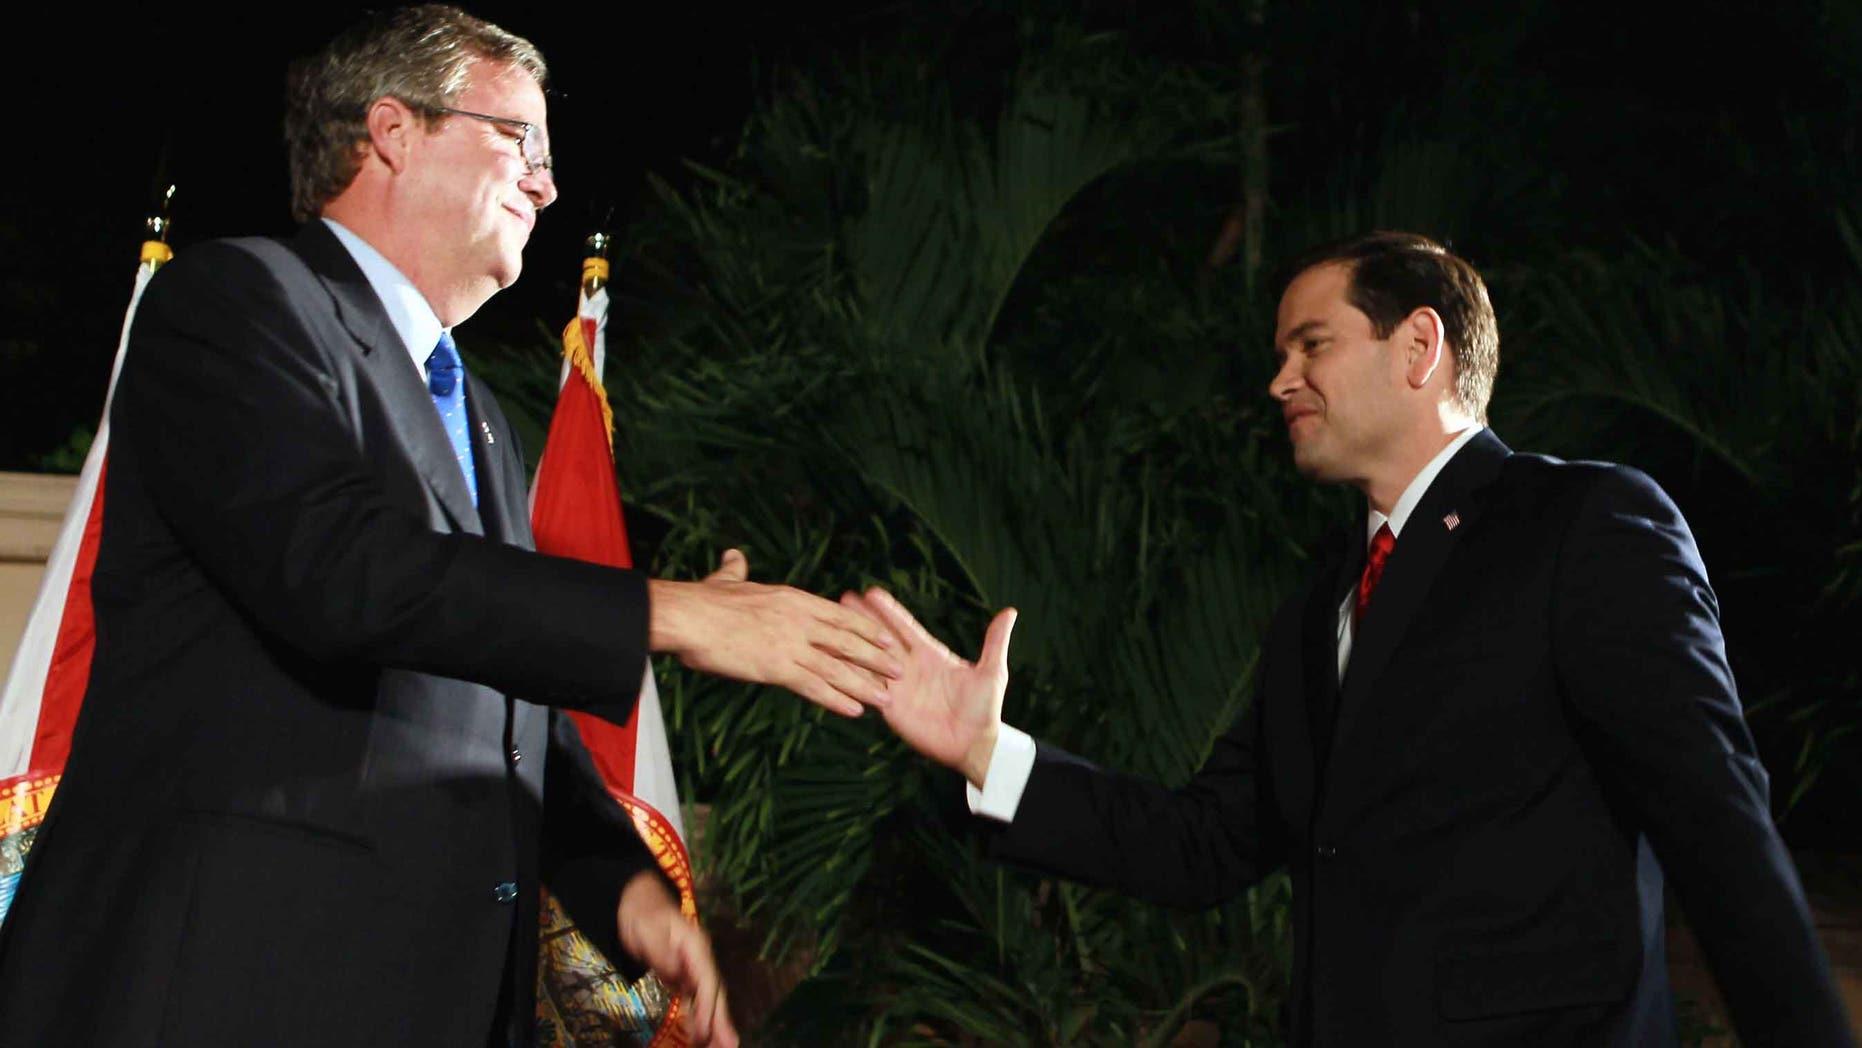 Sen. Marco Rubio  and former Gov. Jeb Bush in a 2010 file photo in Coral Gables, Florida.